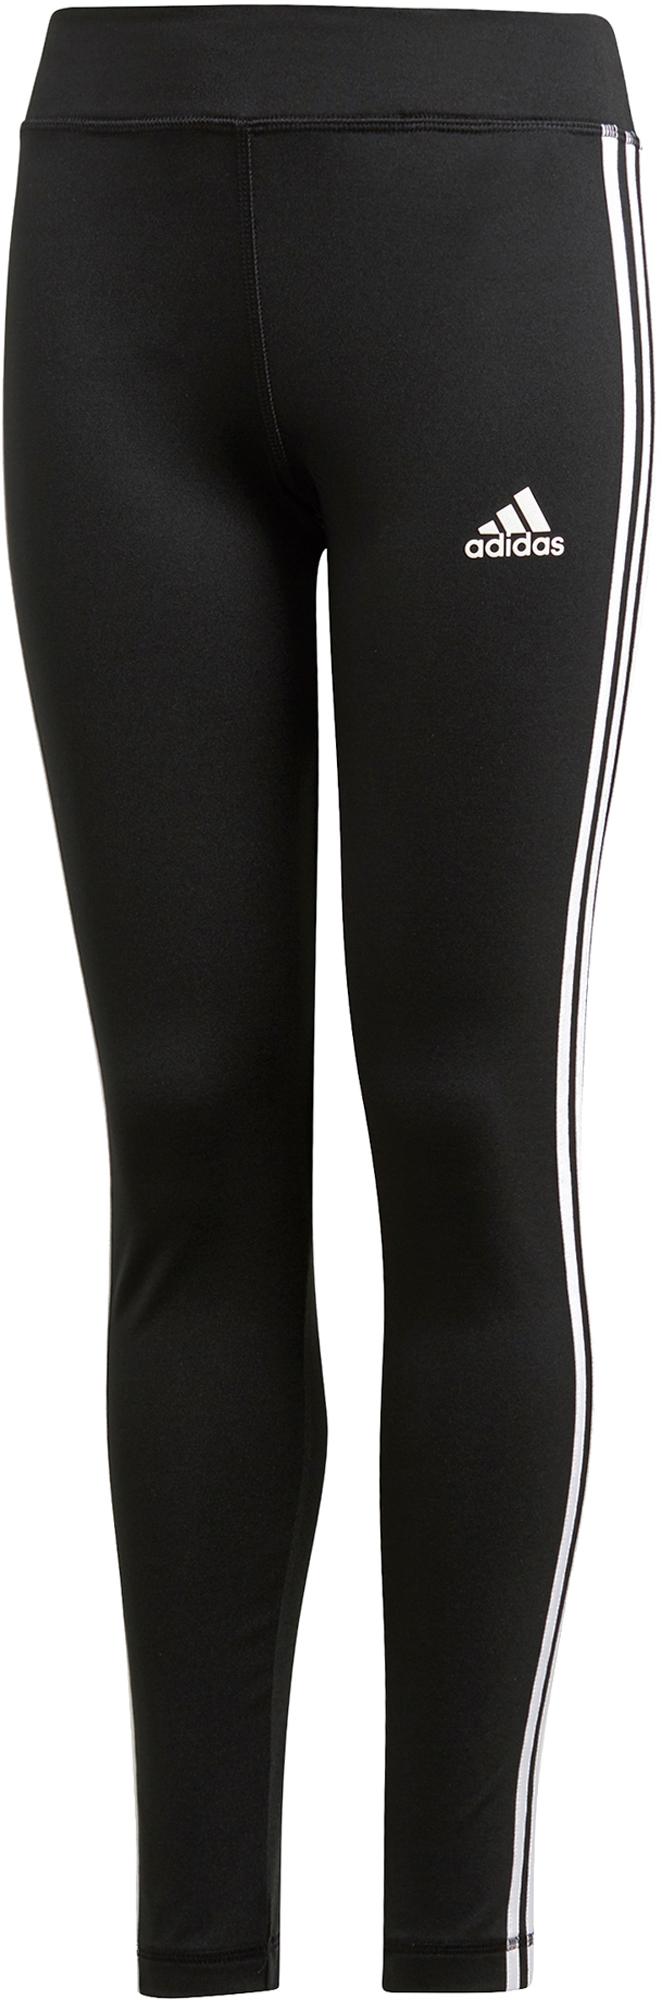 Adidas Легинсы для девочек adidas Equip 3 Stripes, размер 128 adidas легинсы для девочек adidas essentials 3 stripes размер 128